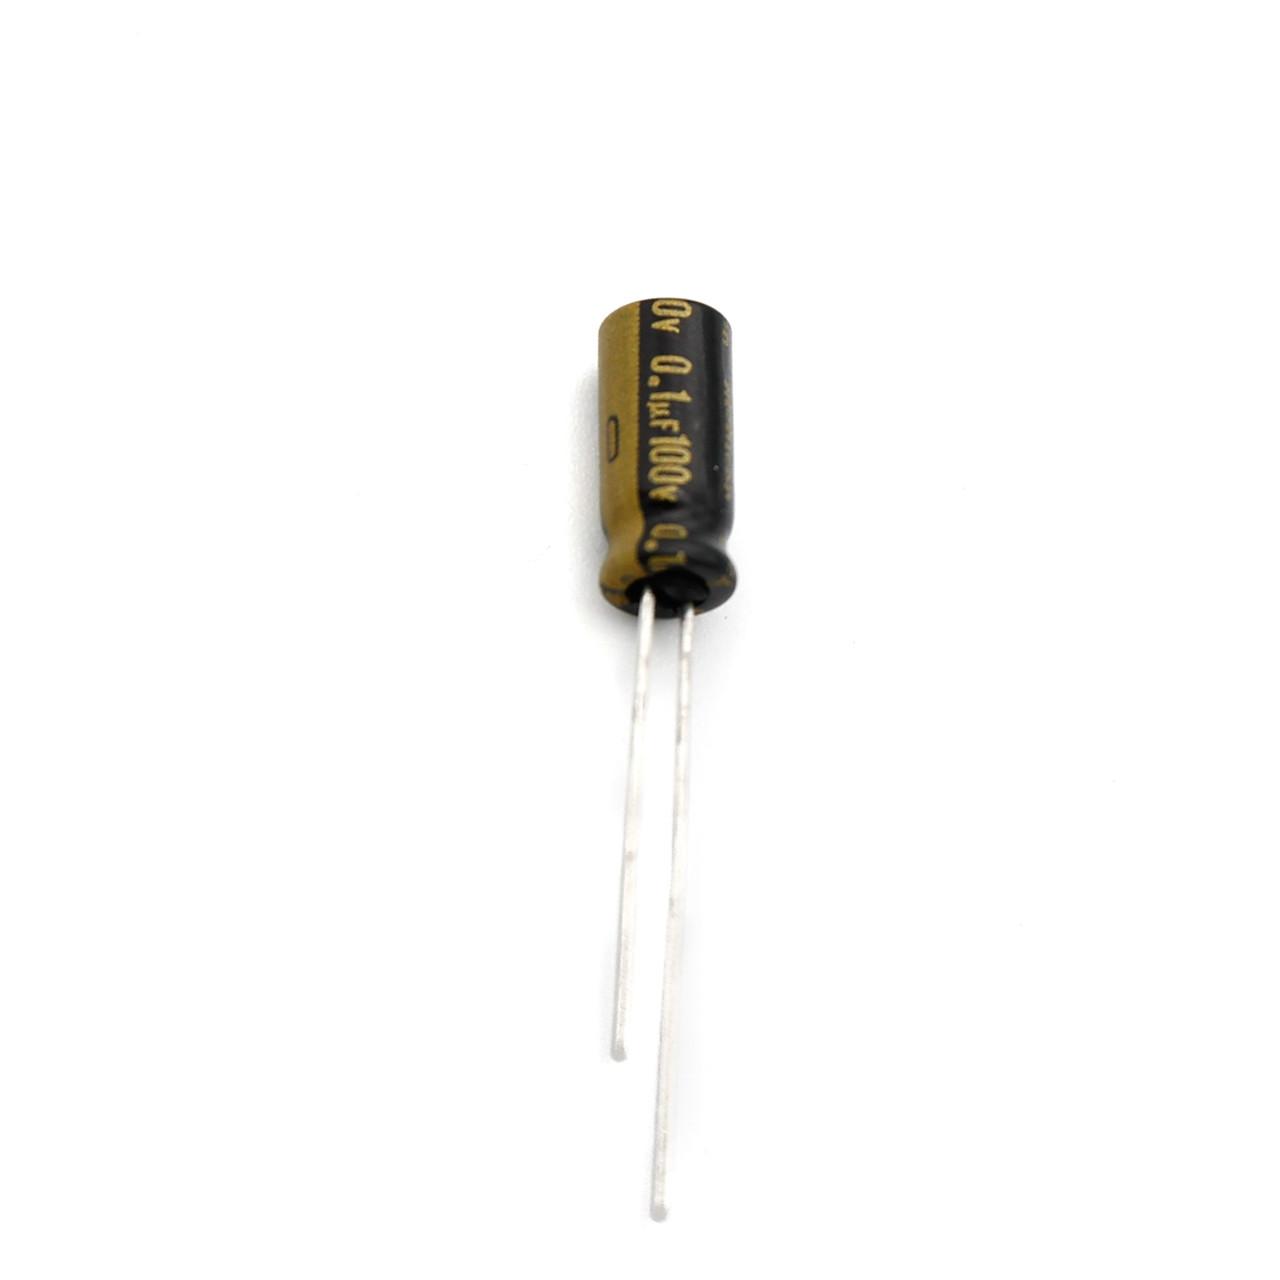 Aluminum Electrolytic Capacitor - Audio Grade - Bag of 10